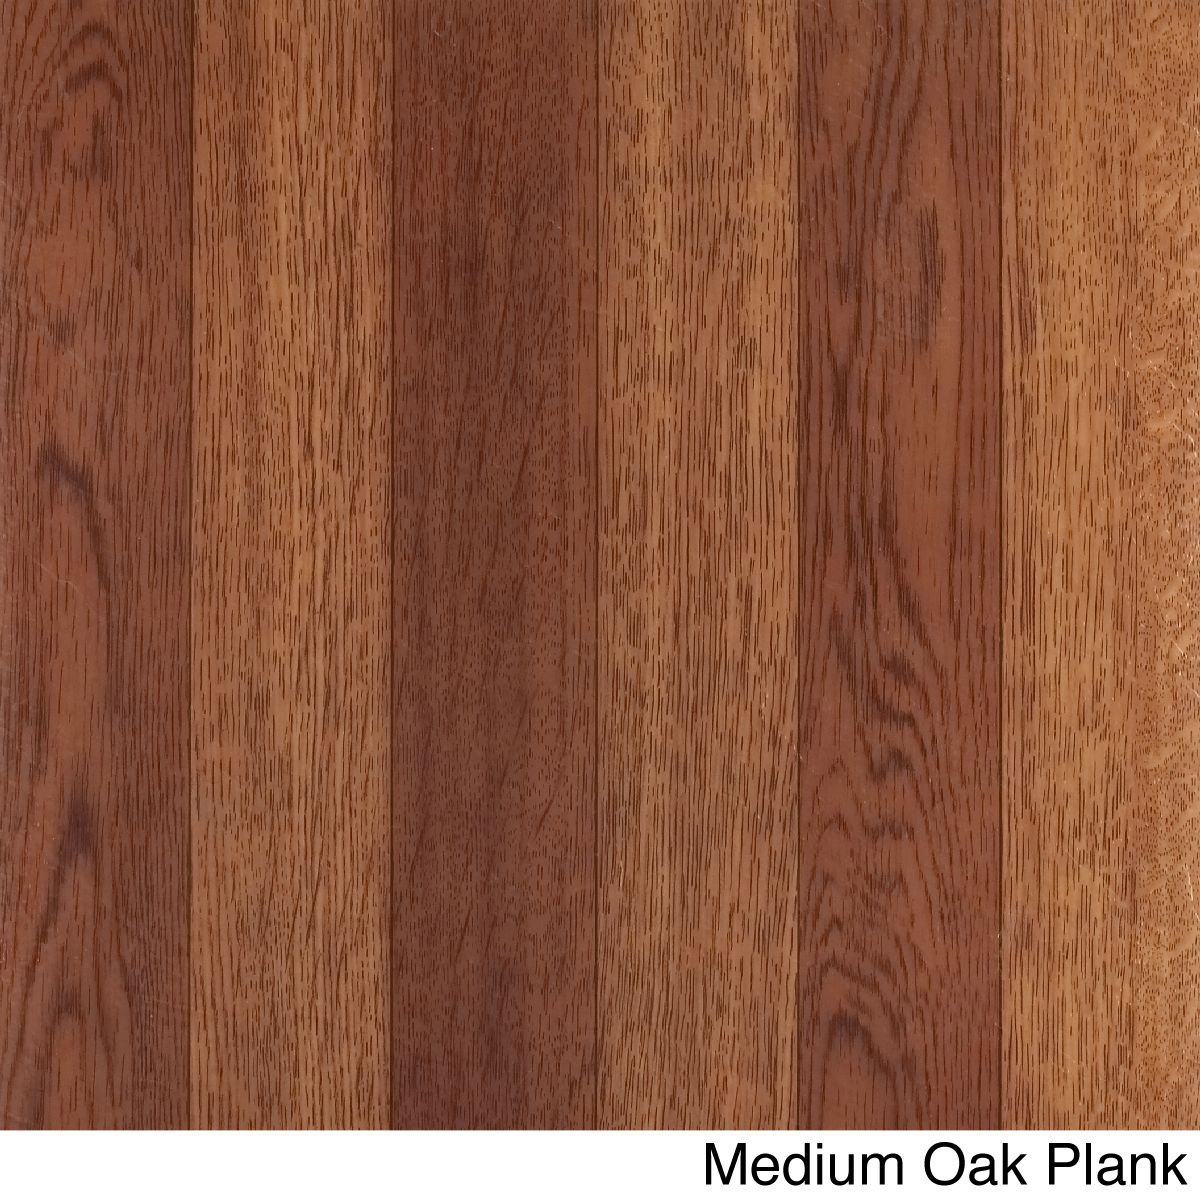 Nexus wood look 12x12 self adhesive vinyl floor tile 20 tiles20 nexus wood look 12x12 self adhesive vinyl floor tile 20 tiles20 sq dailygadgetfo Images